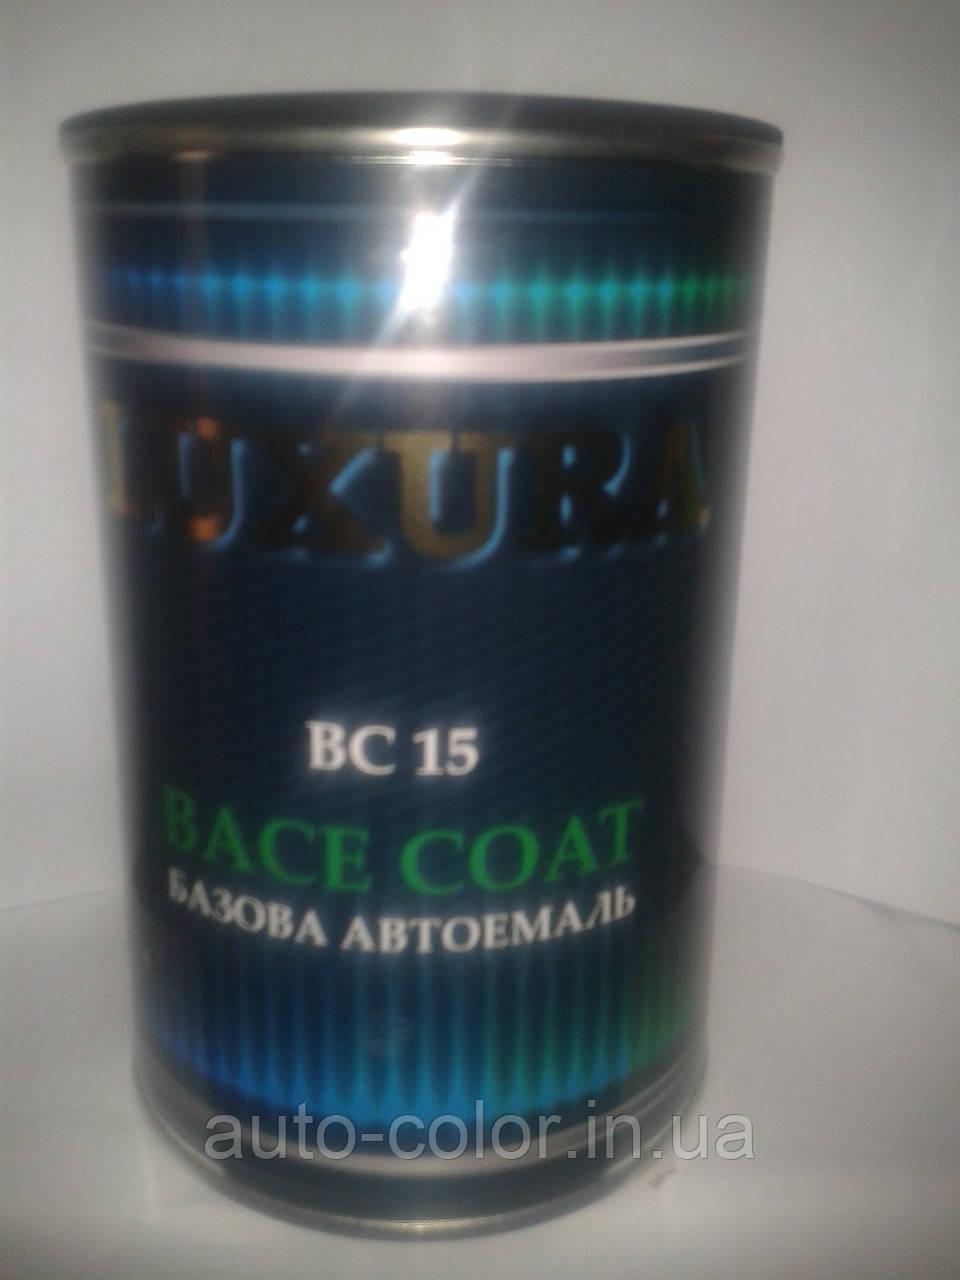 448 Рапсодія Базова автоемаль Luxura 1 л